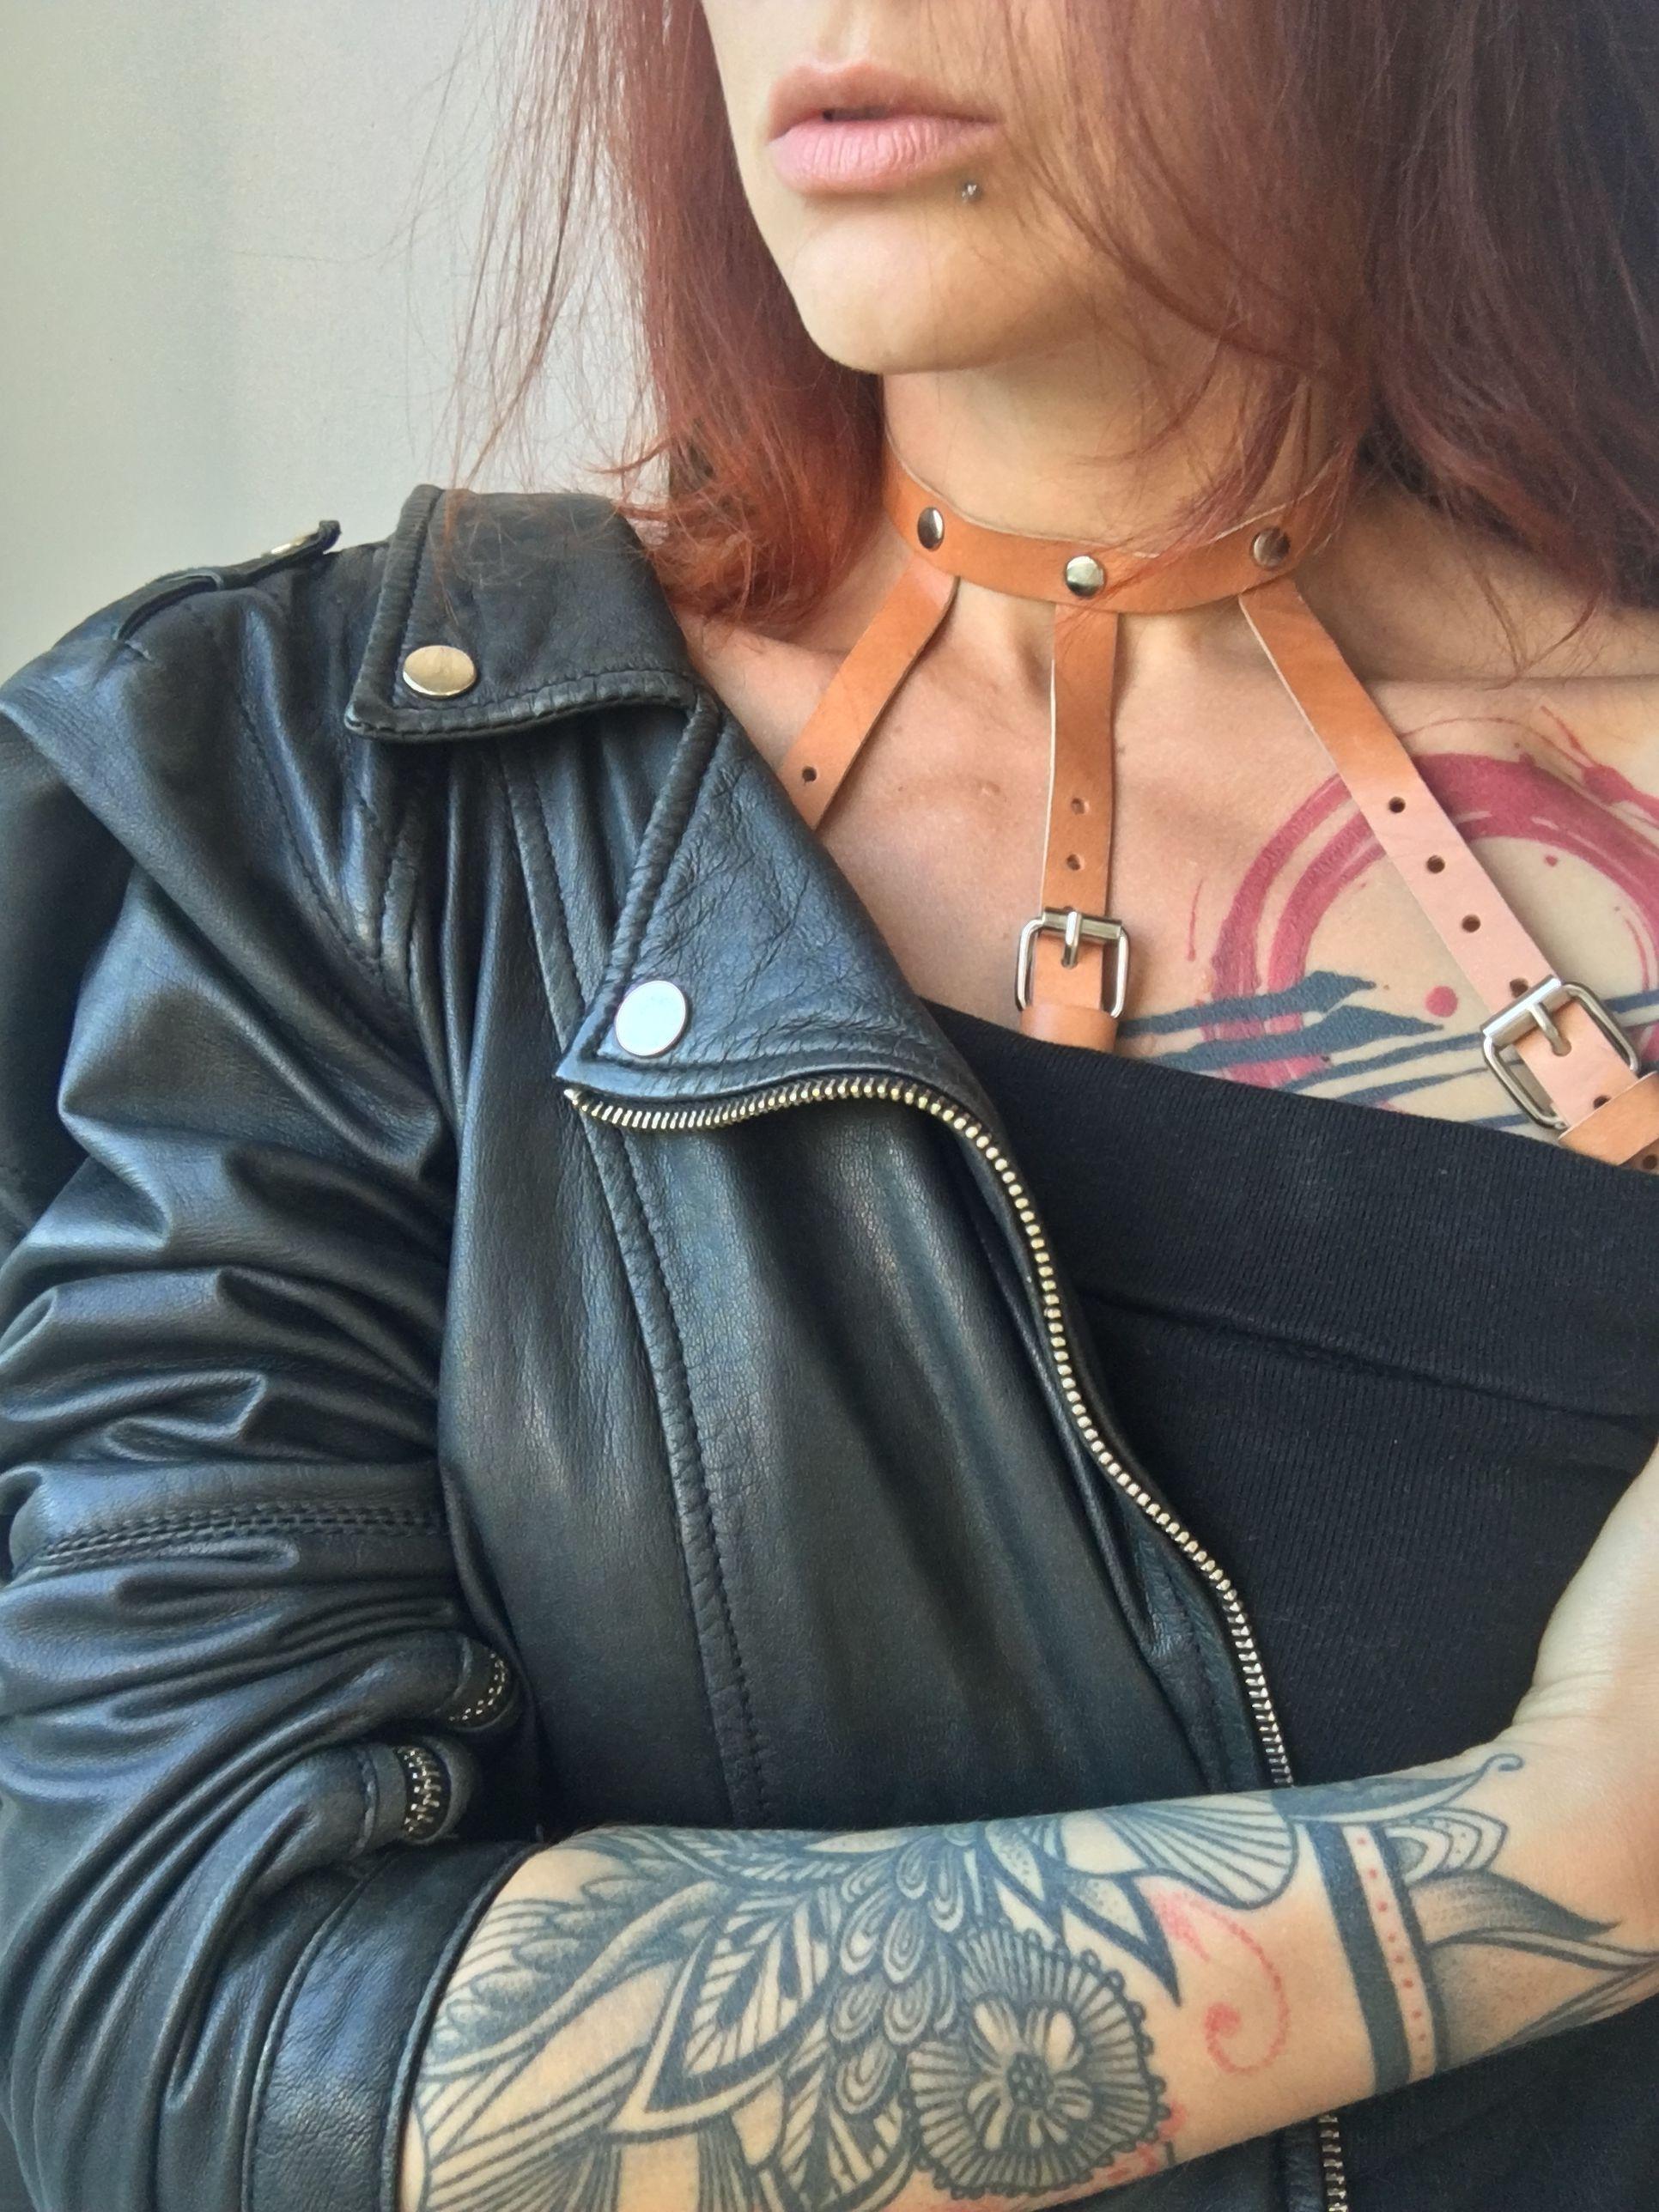 d13f98ebd3 Beige Leather Harness Bra Bondage Body Harness Open Bra Harness Chest  Harness Plus Size Harness for